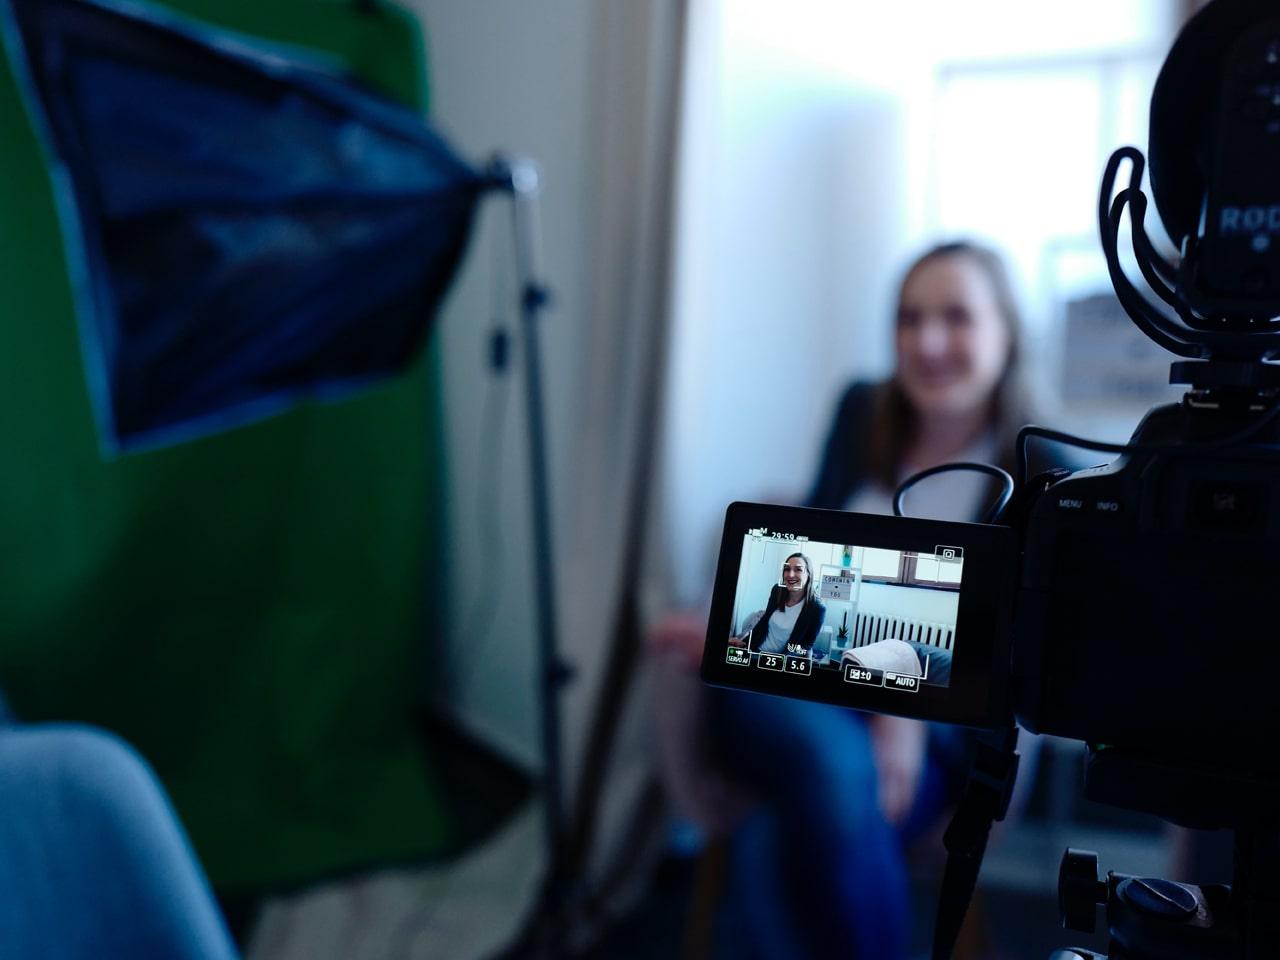 Photography, Movie - 映像撮影 | SPIDER'S INTRODUCTION(ポスター、チラシ制作の説明ページ) | WEB DESIGN(ホームページ制作),LOGO DESIGN(ロゴデザイン),TRANSLATION(映像字幕、書類翻訳サービス),Promotion Video(プロモーション映像),Flyer - Poster DESIGN(フライヤー・チラシ制作),Shopping Site(ショッピングサイト),Creative designs in Brooklyn(ブルックリン),New york(ニューヨーク)